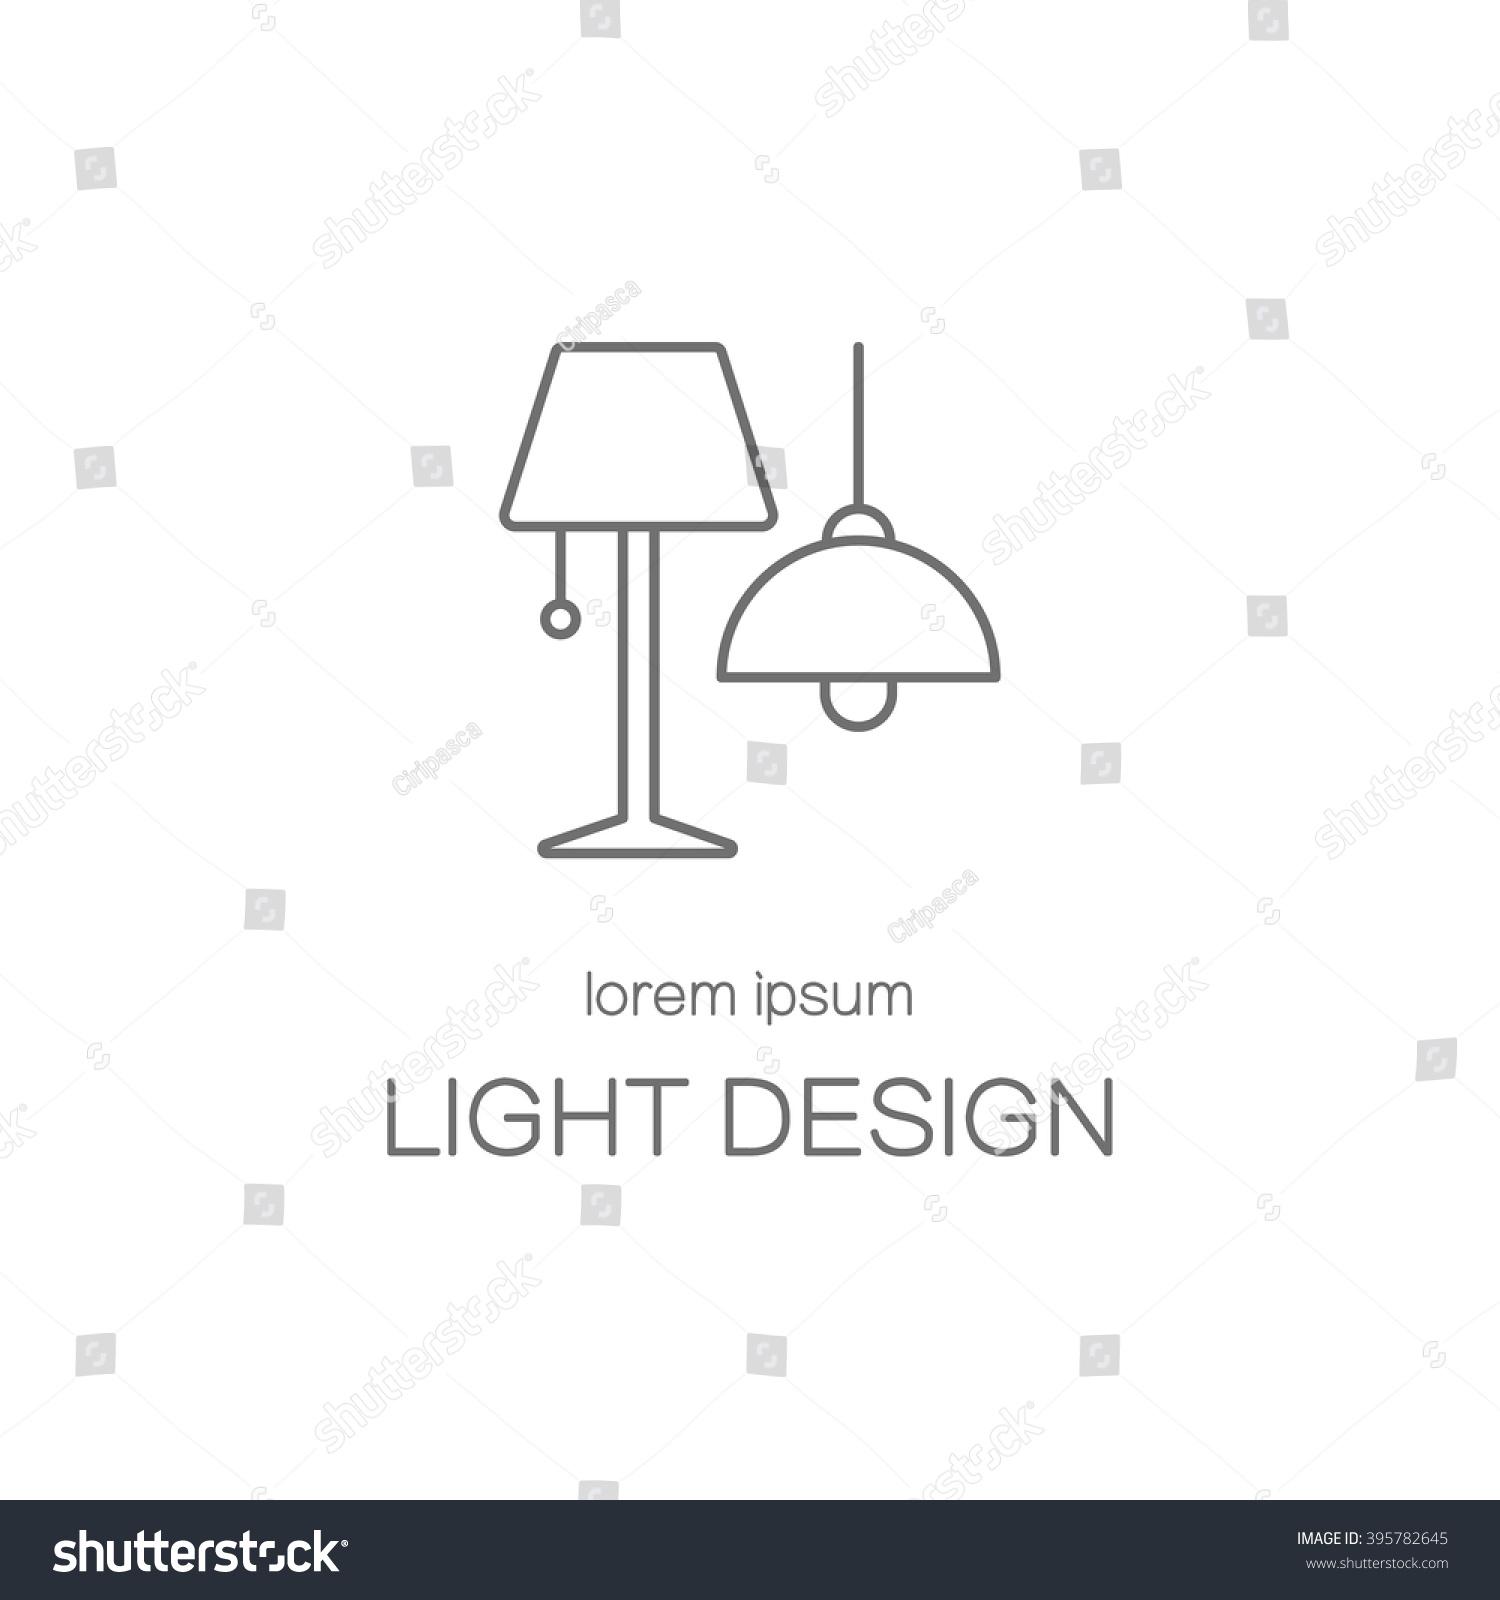 Light design house line icon logotype design templates modern easy to edit logo template